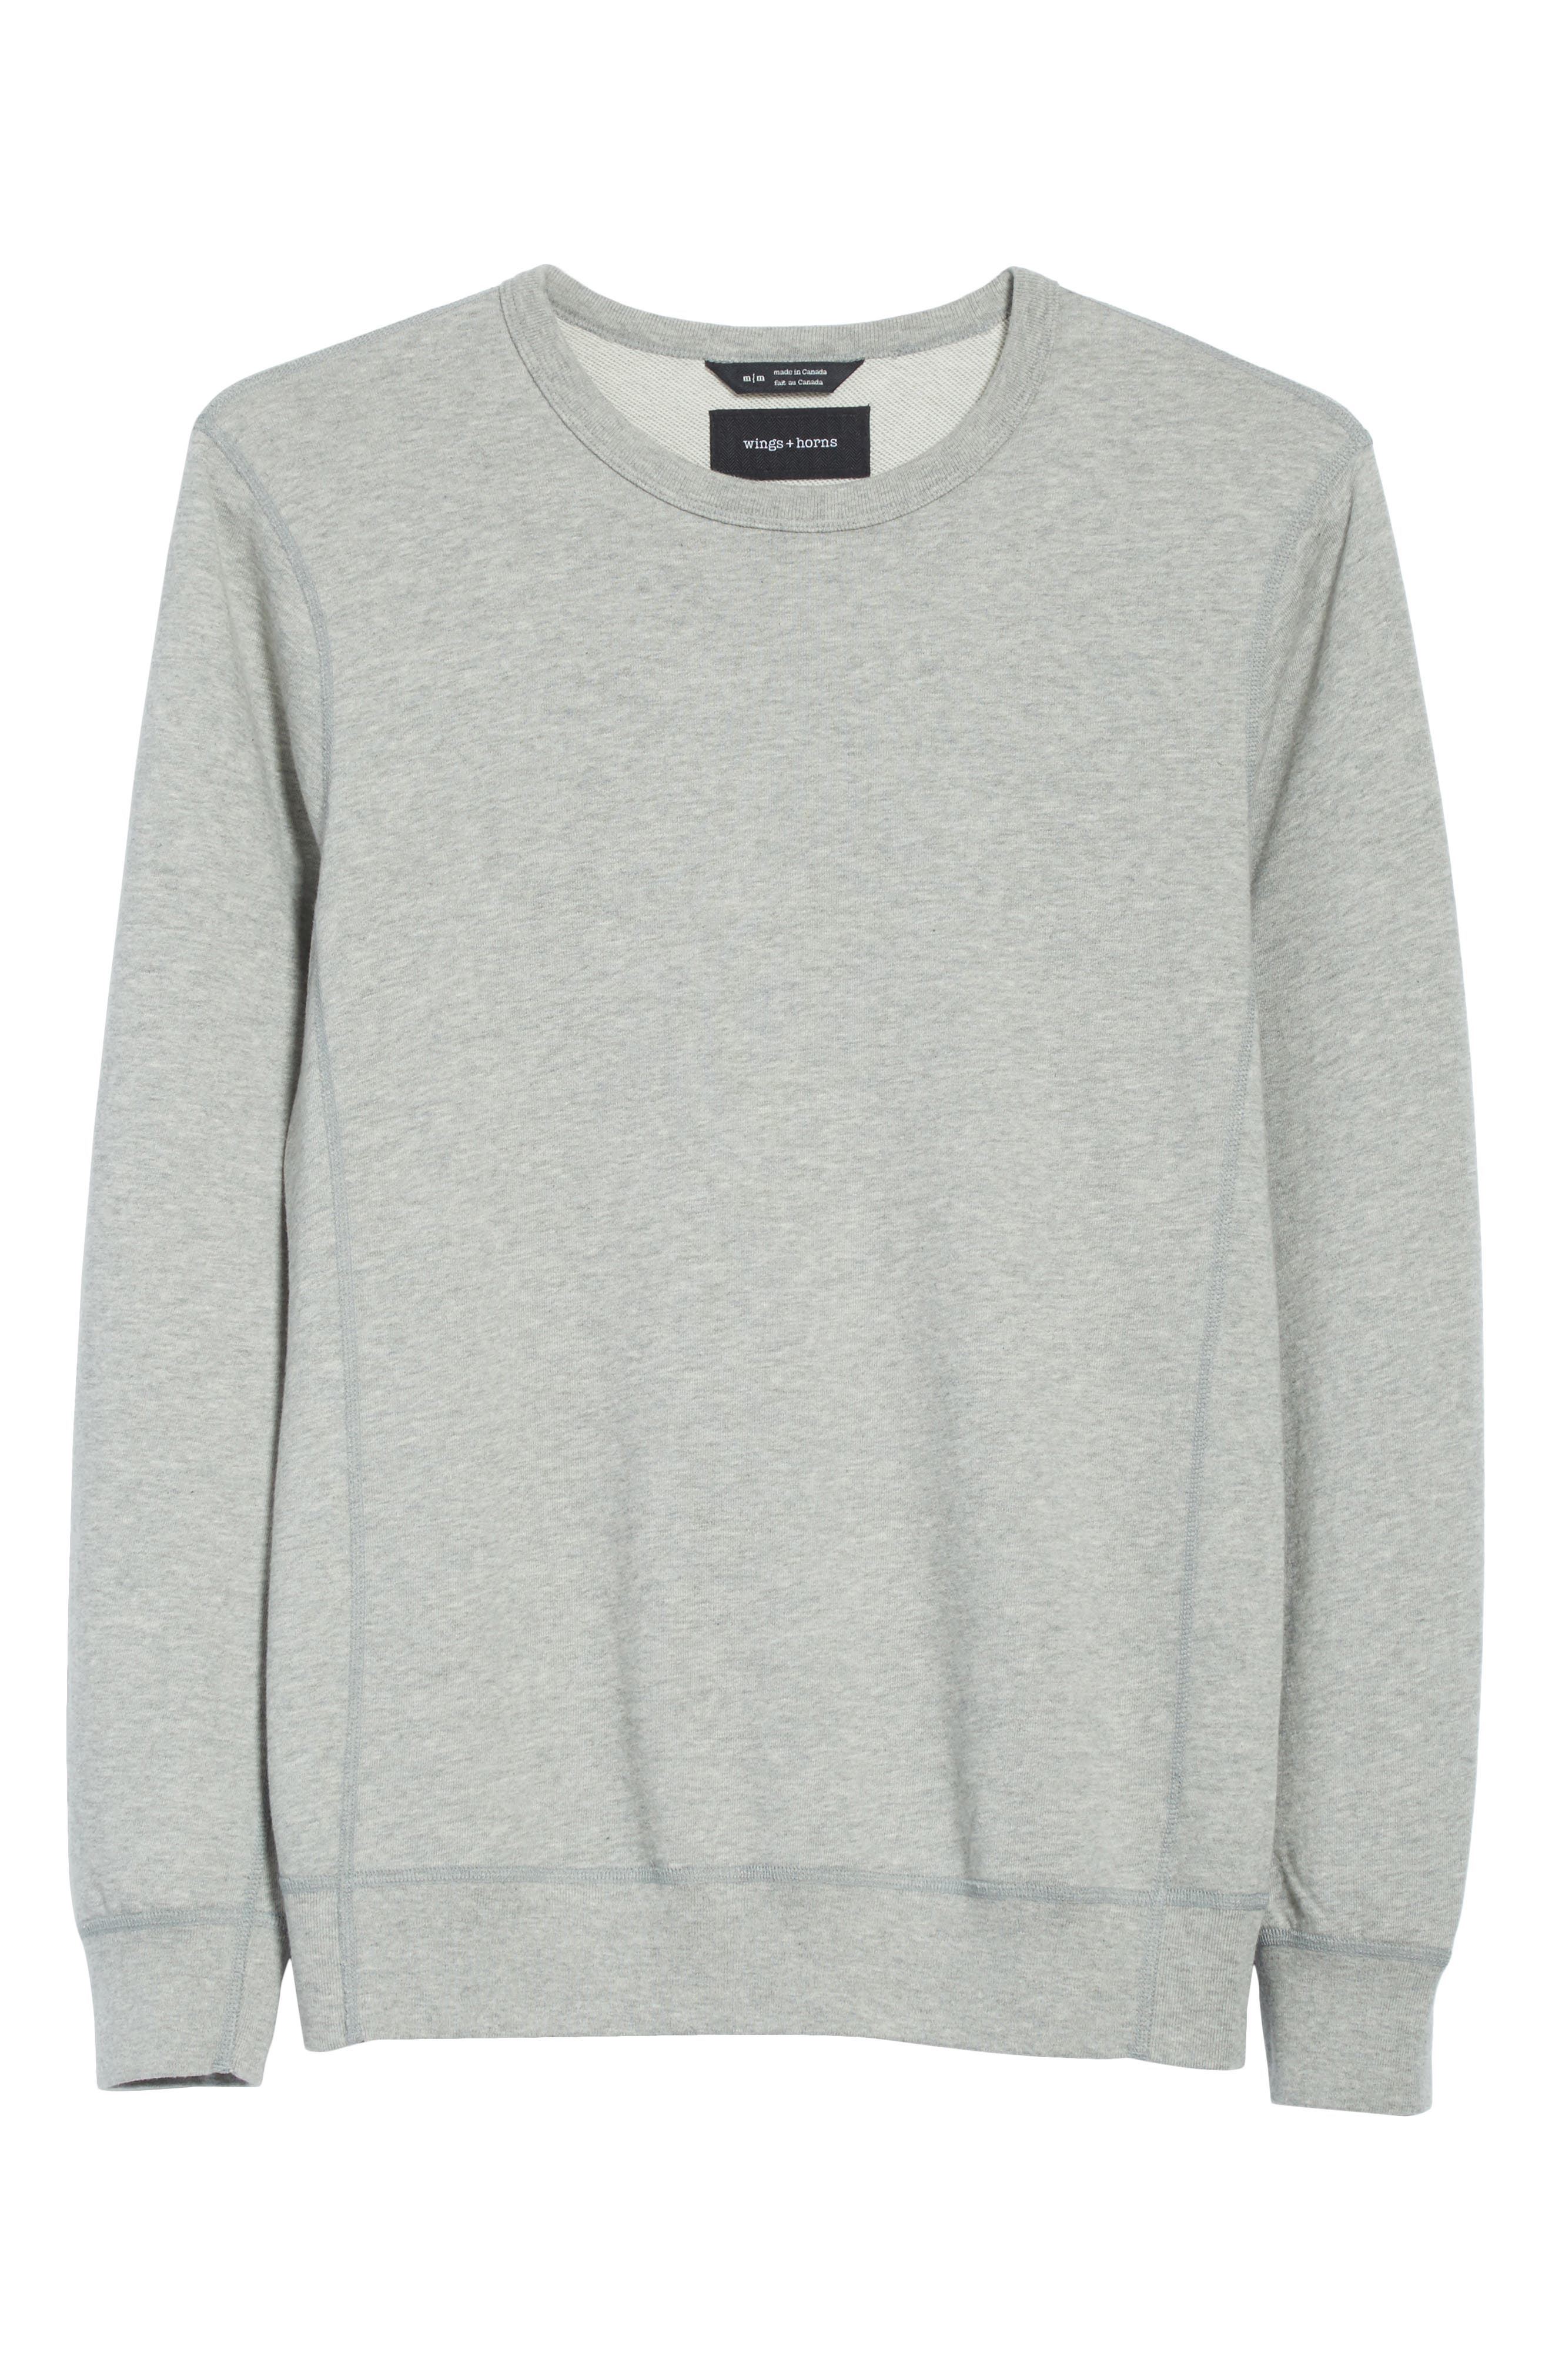 Crewneck Sweatshirt,                             Alternate thumbnail 6, color,                             060